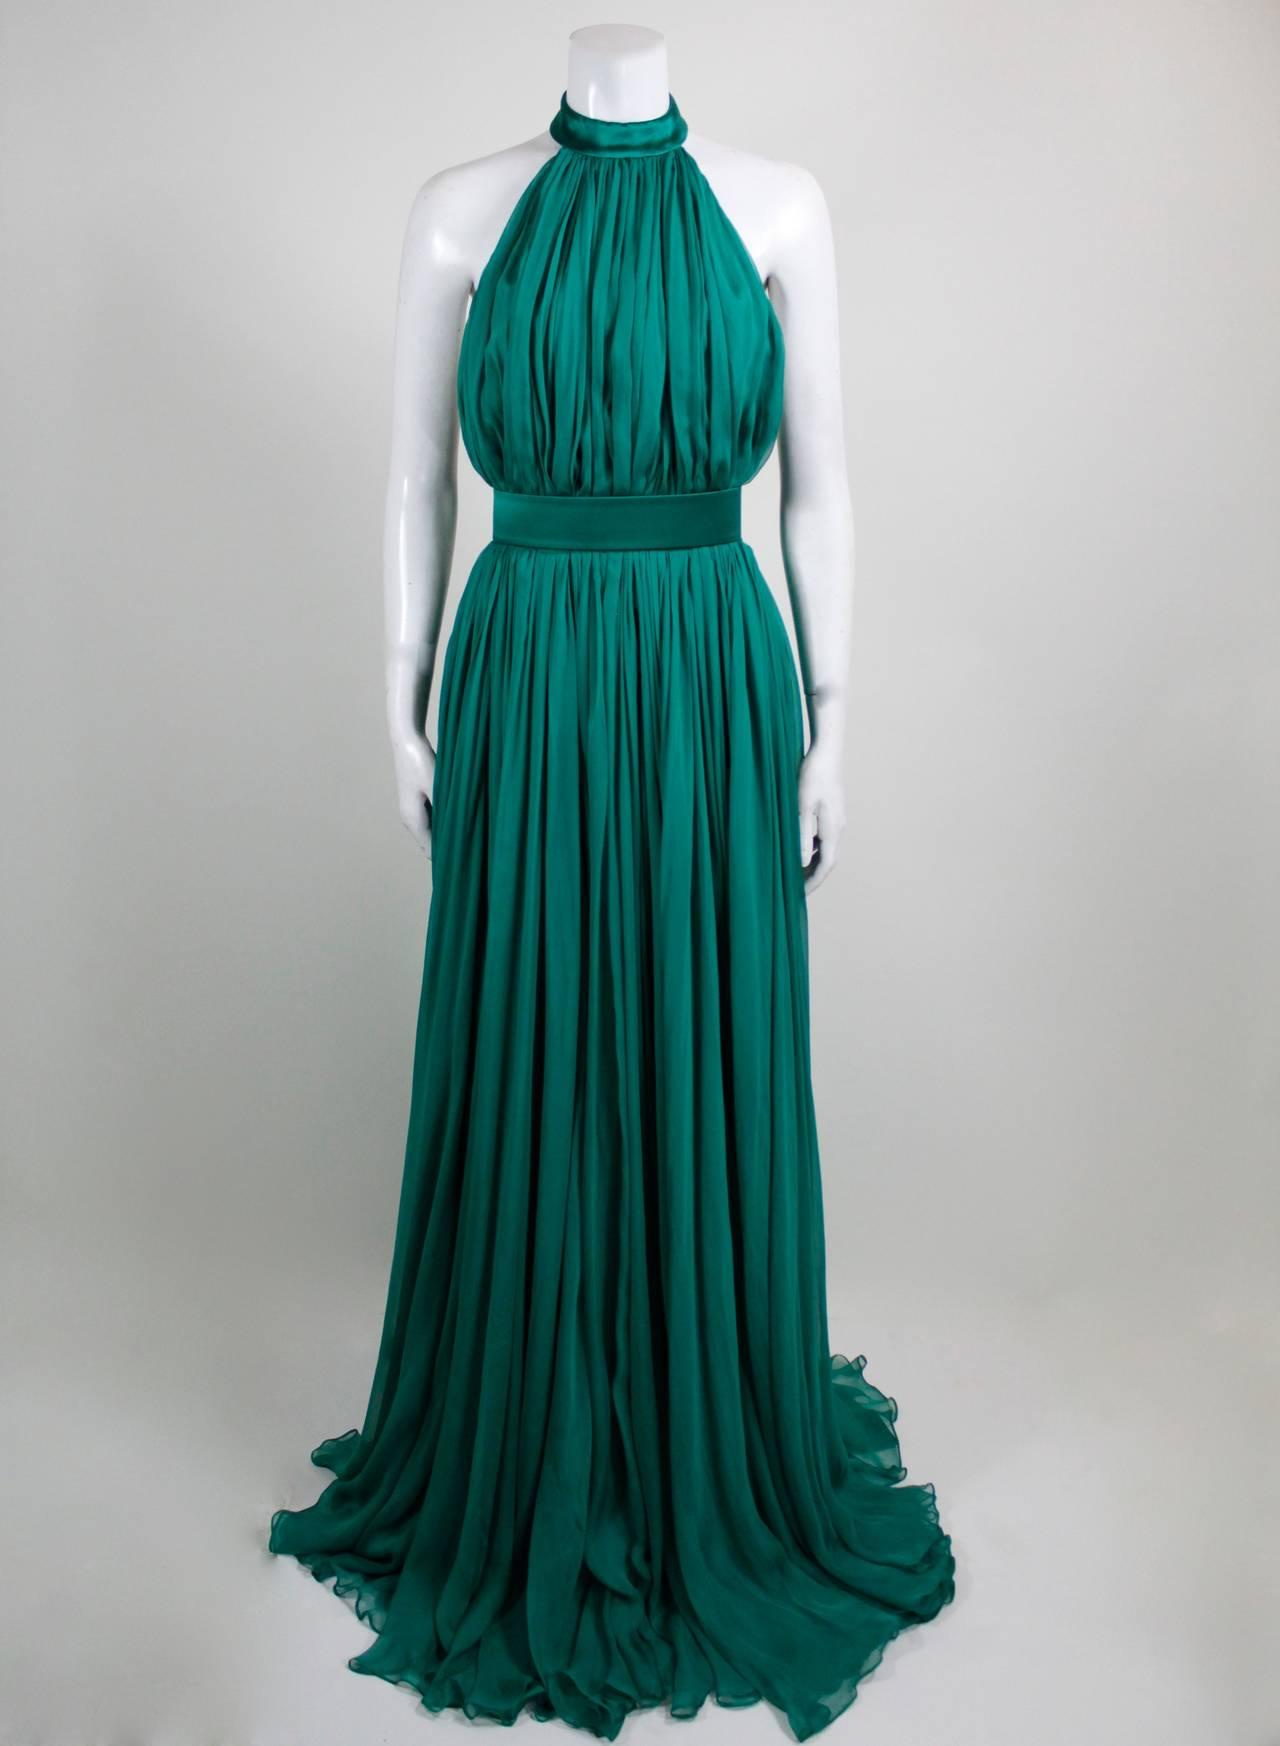 Alexander McQueen 2010 Flowing Emerald Green Chiffon Halter Gown with Belt 3